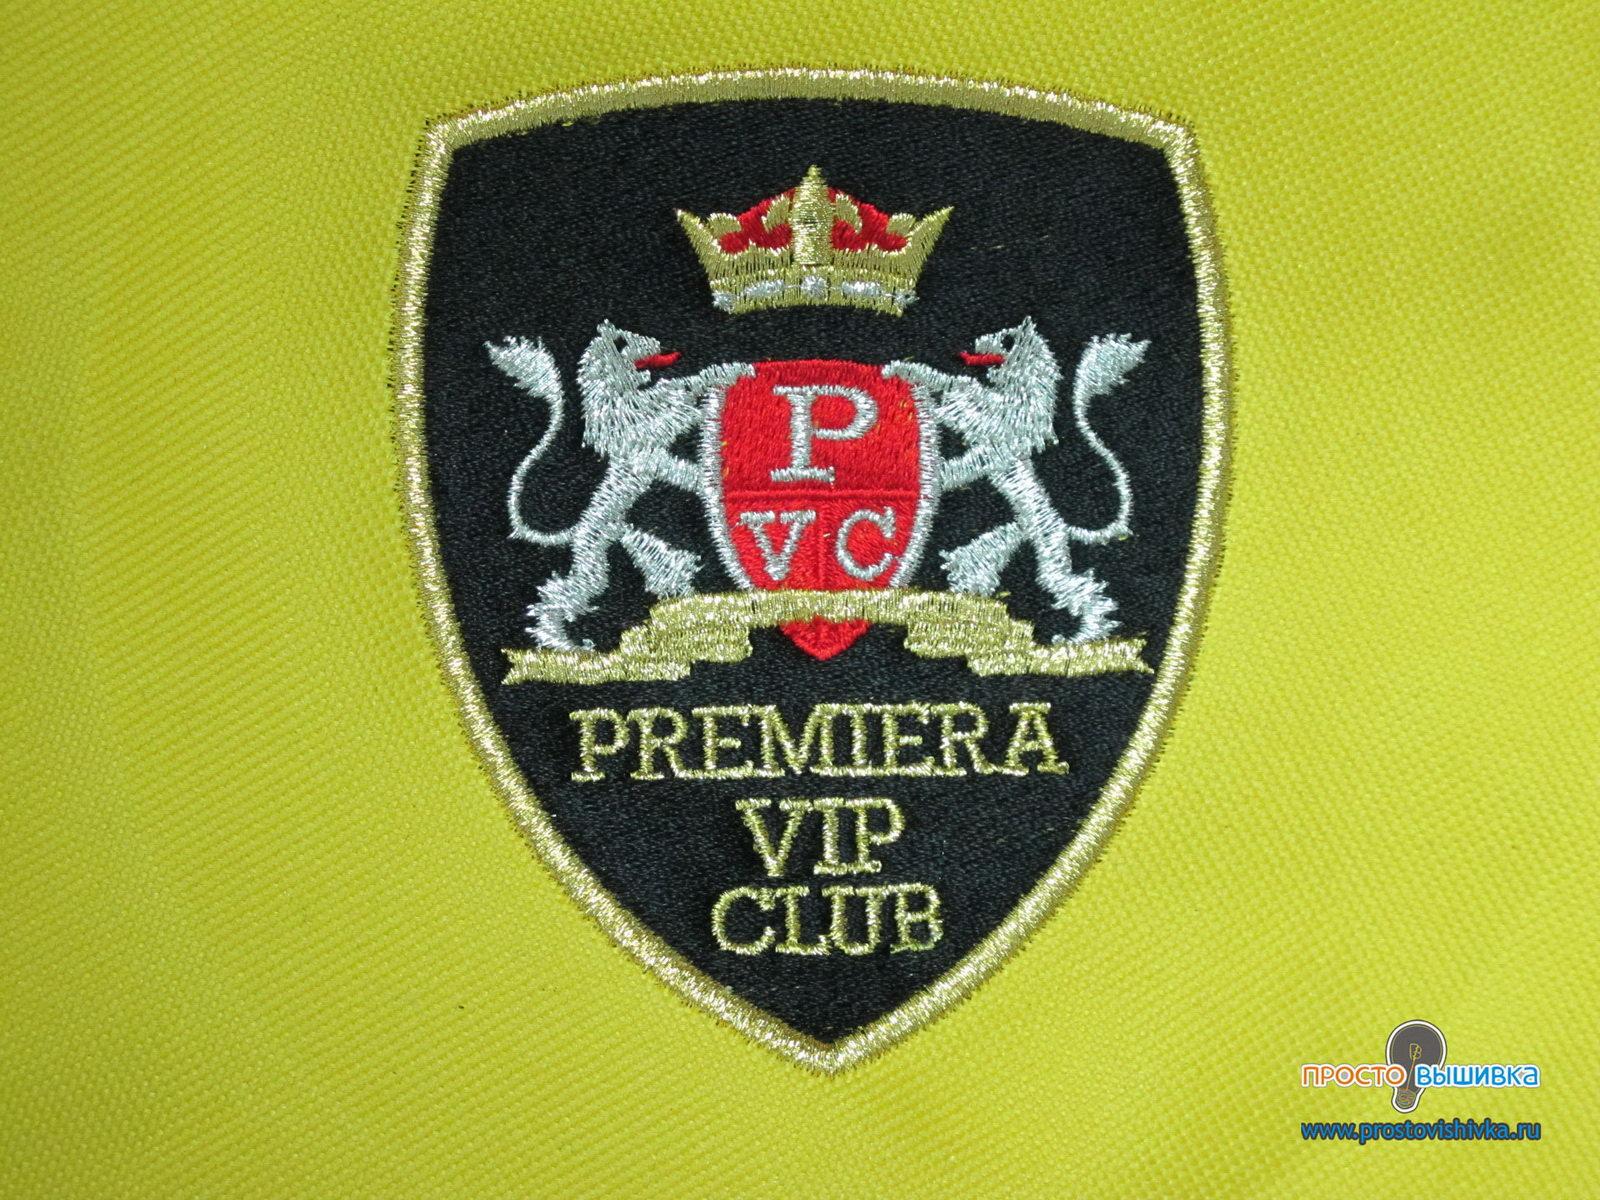 вышивка логотипа на ткани: